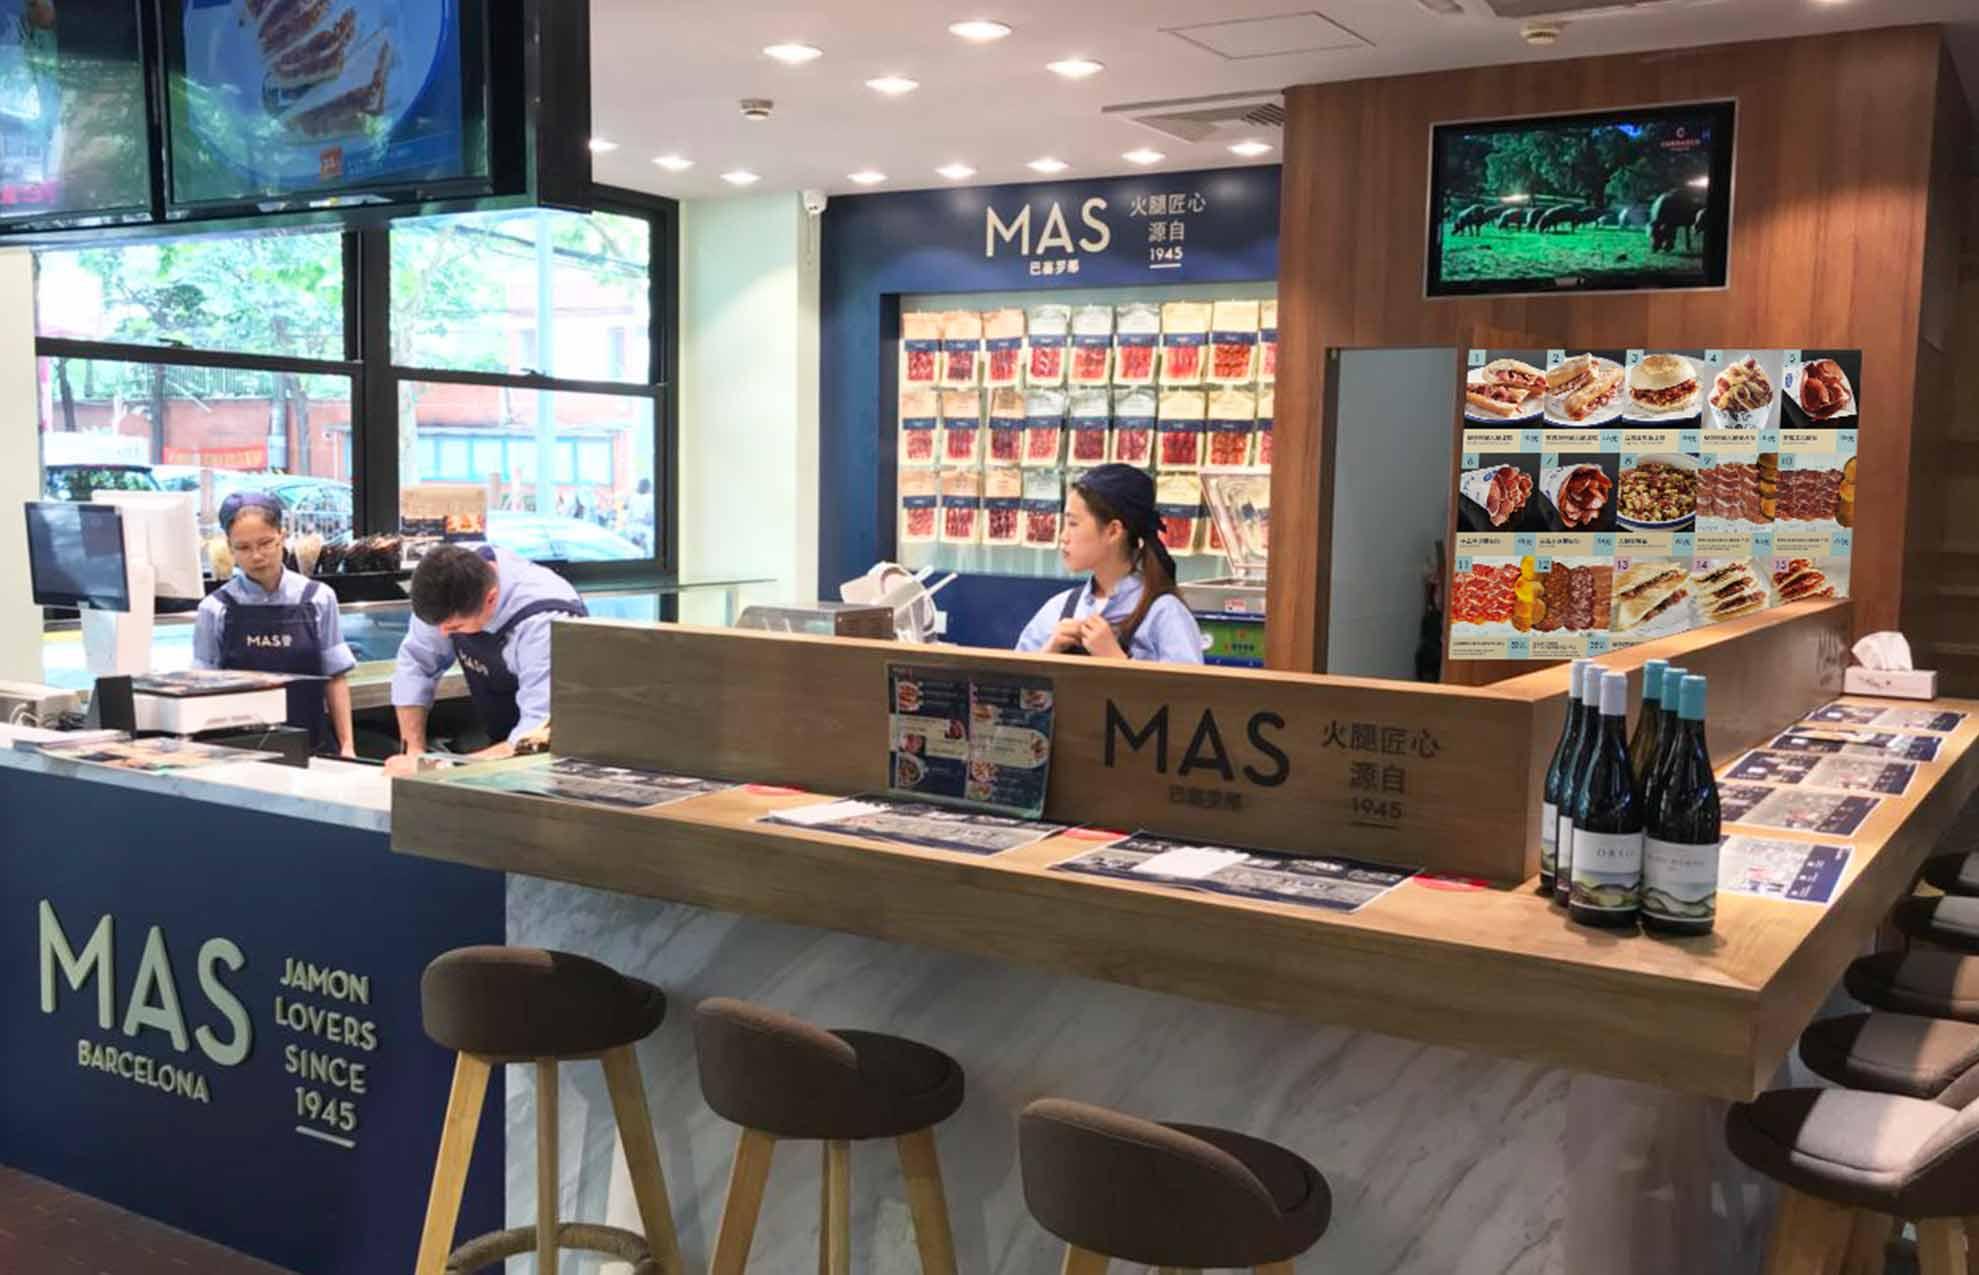 disseny grafic restaurant xina - Estrategia en branding y comunicación comercial para exportar a China